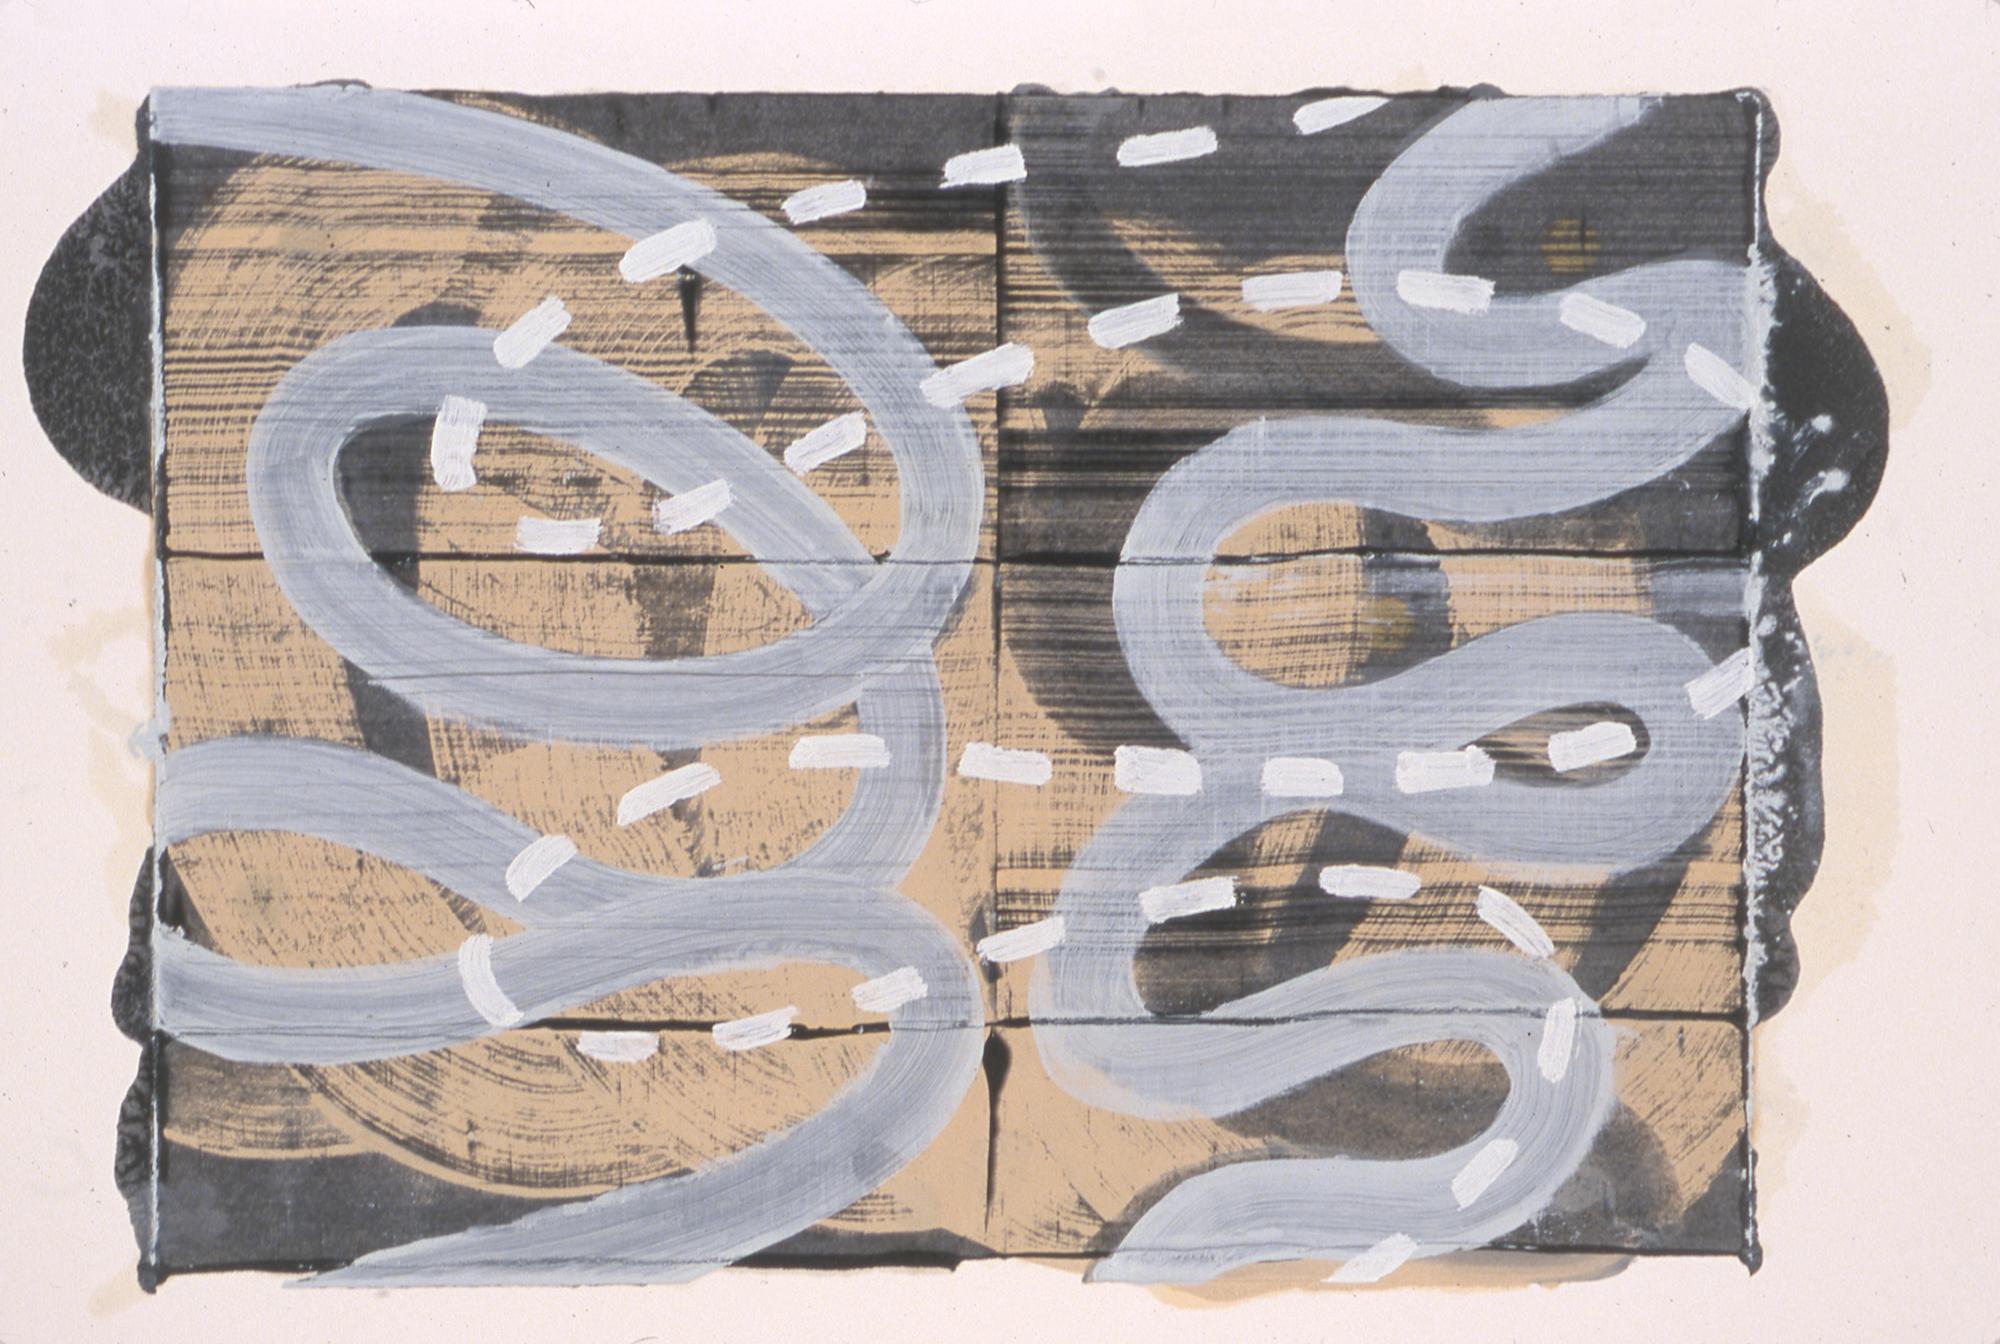 David Row - Brids, Bees, Etc.